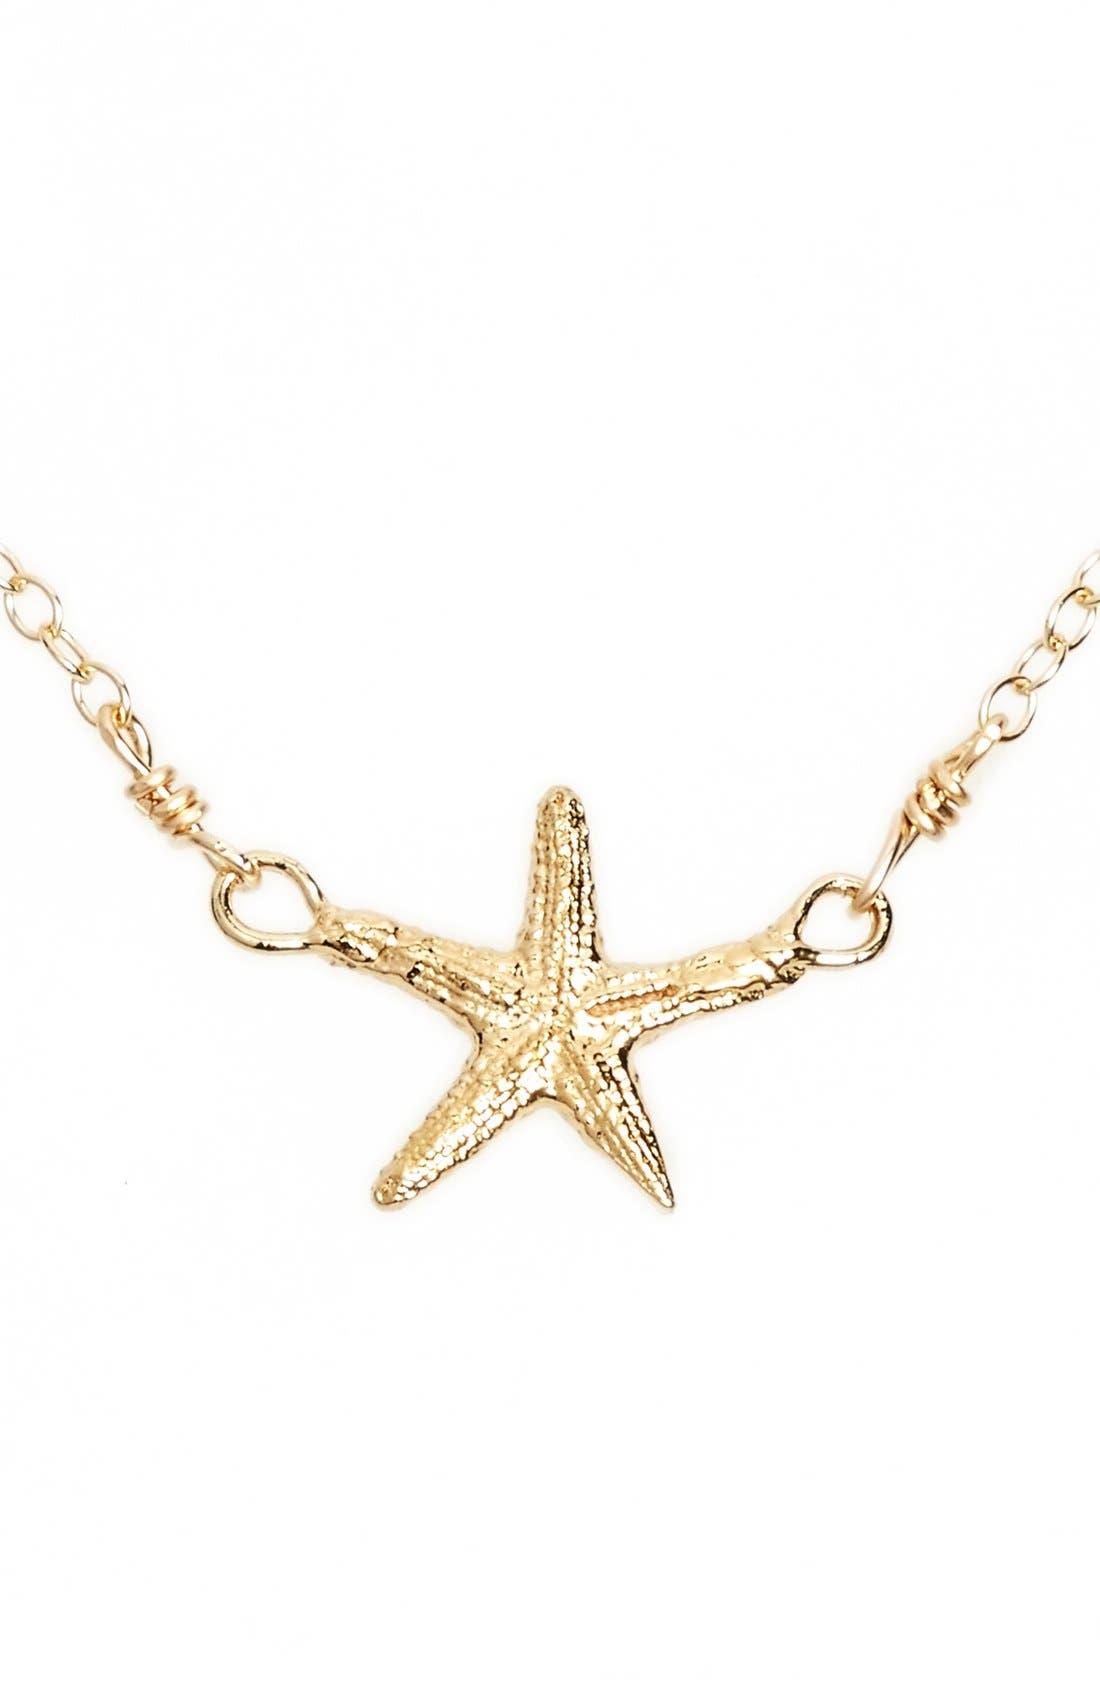 ki-ele 'Manini' Starfish Pendant Necklace